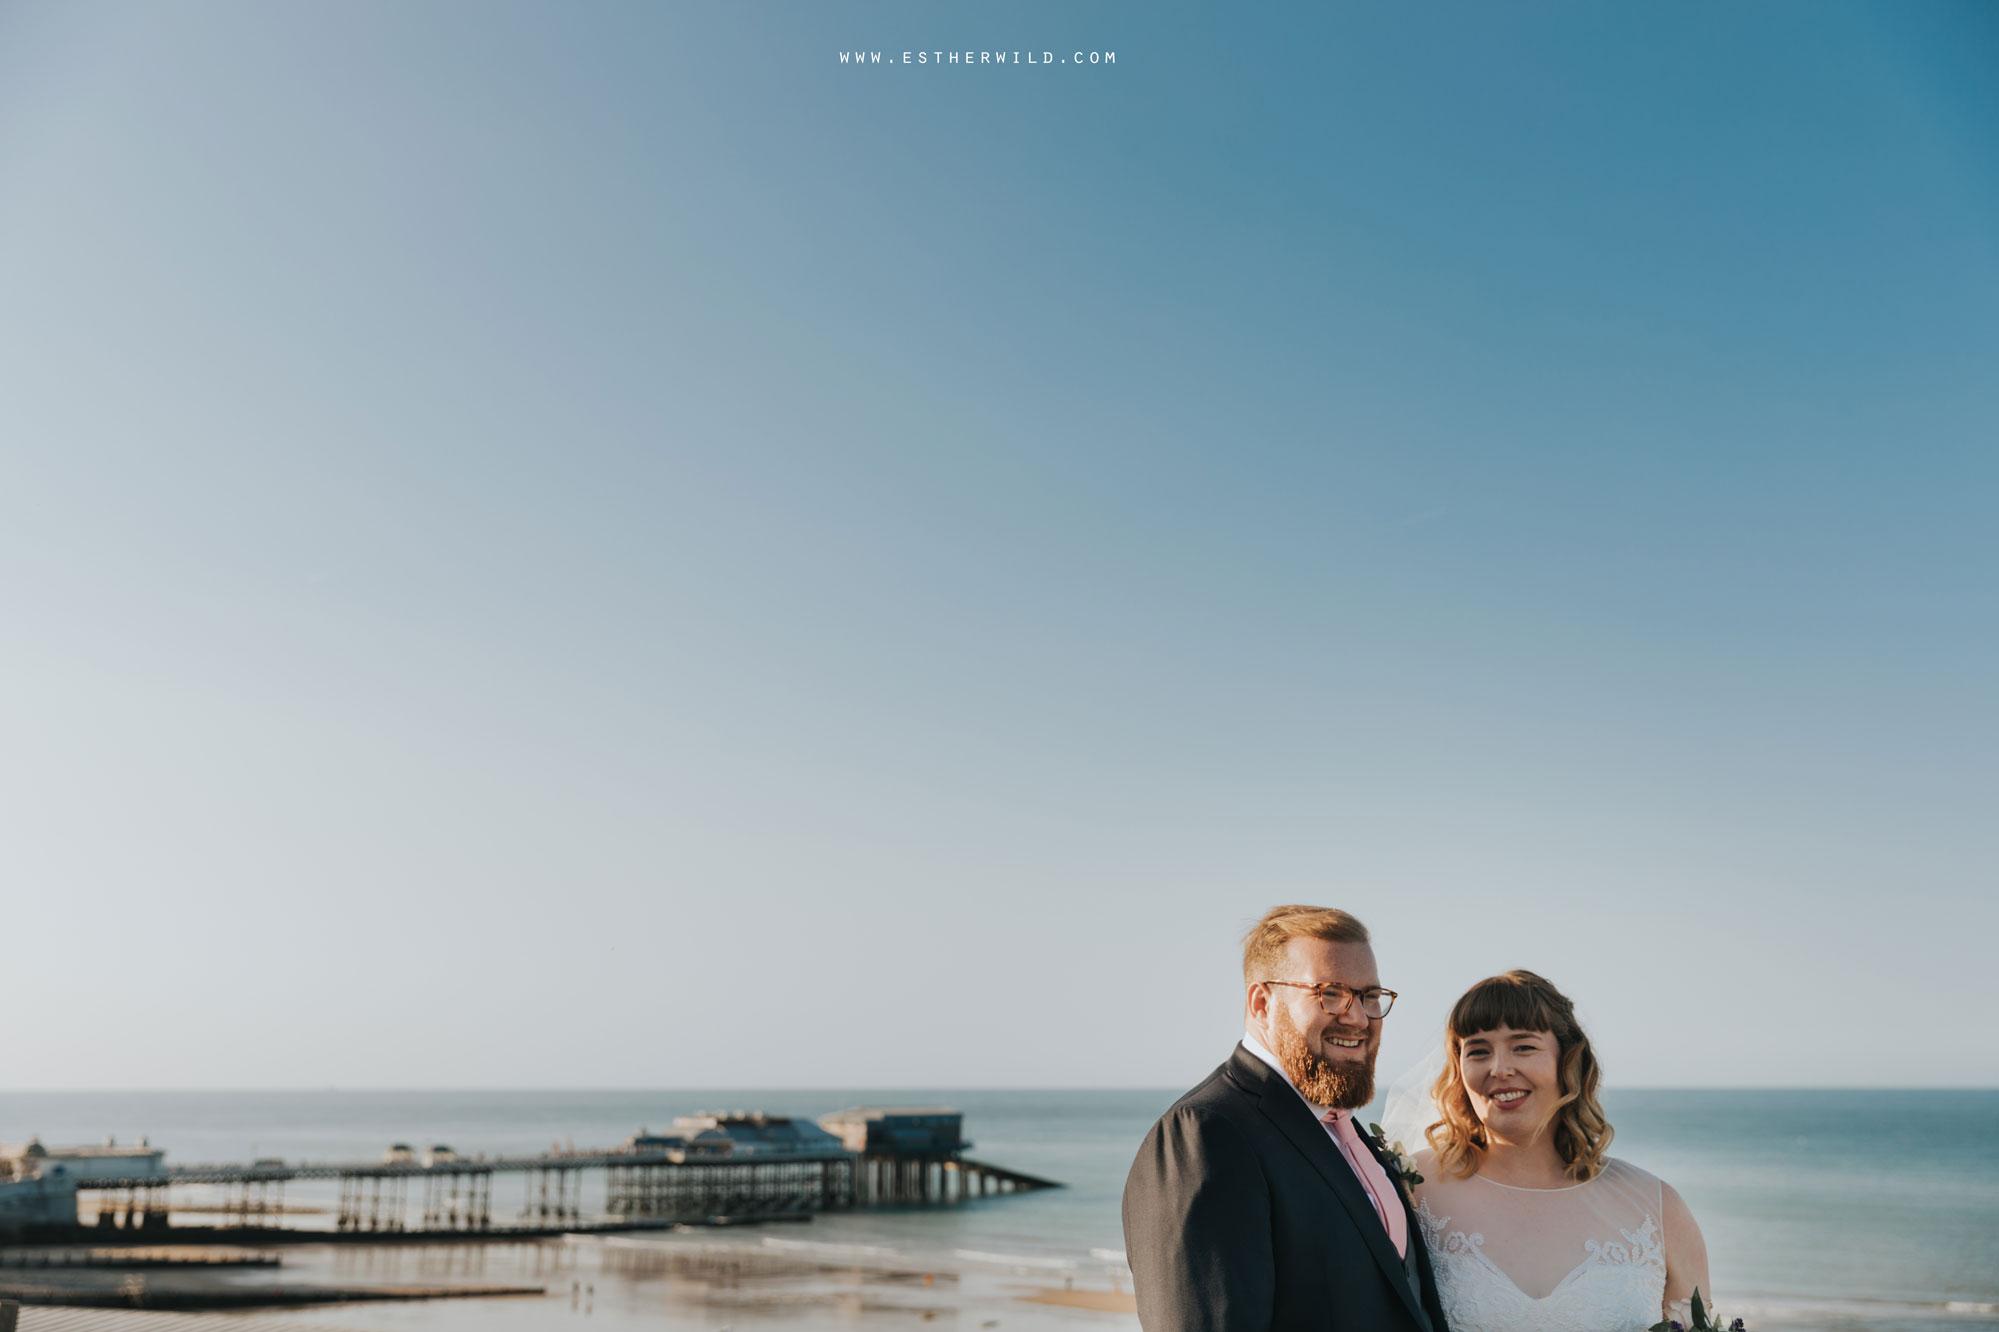 Cromer_Wedding_Beach_Outdoor_Ceremony_Norfolk_North_Lodge_Registry_Office_Rocket_House_Cafe_Cromer_Pier_IMG_4509.jpg